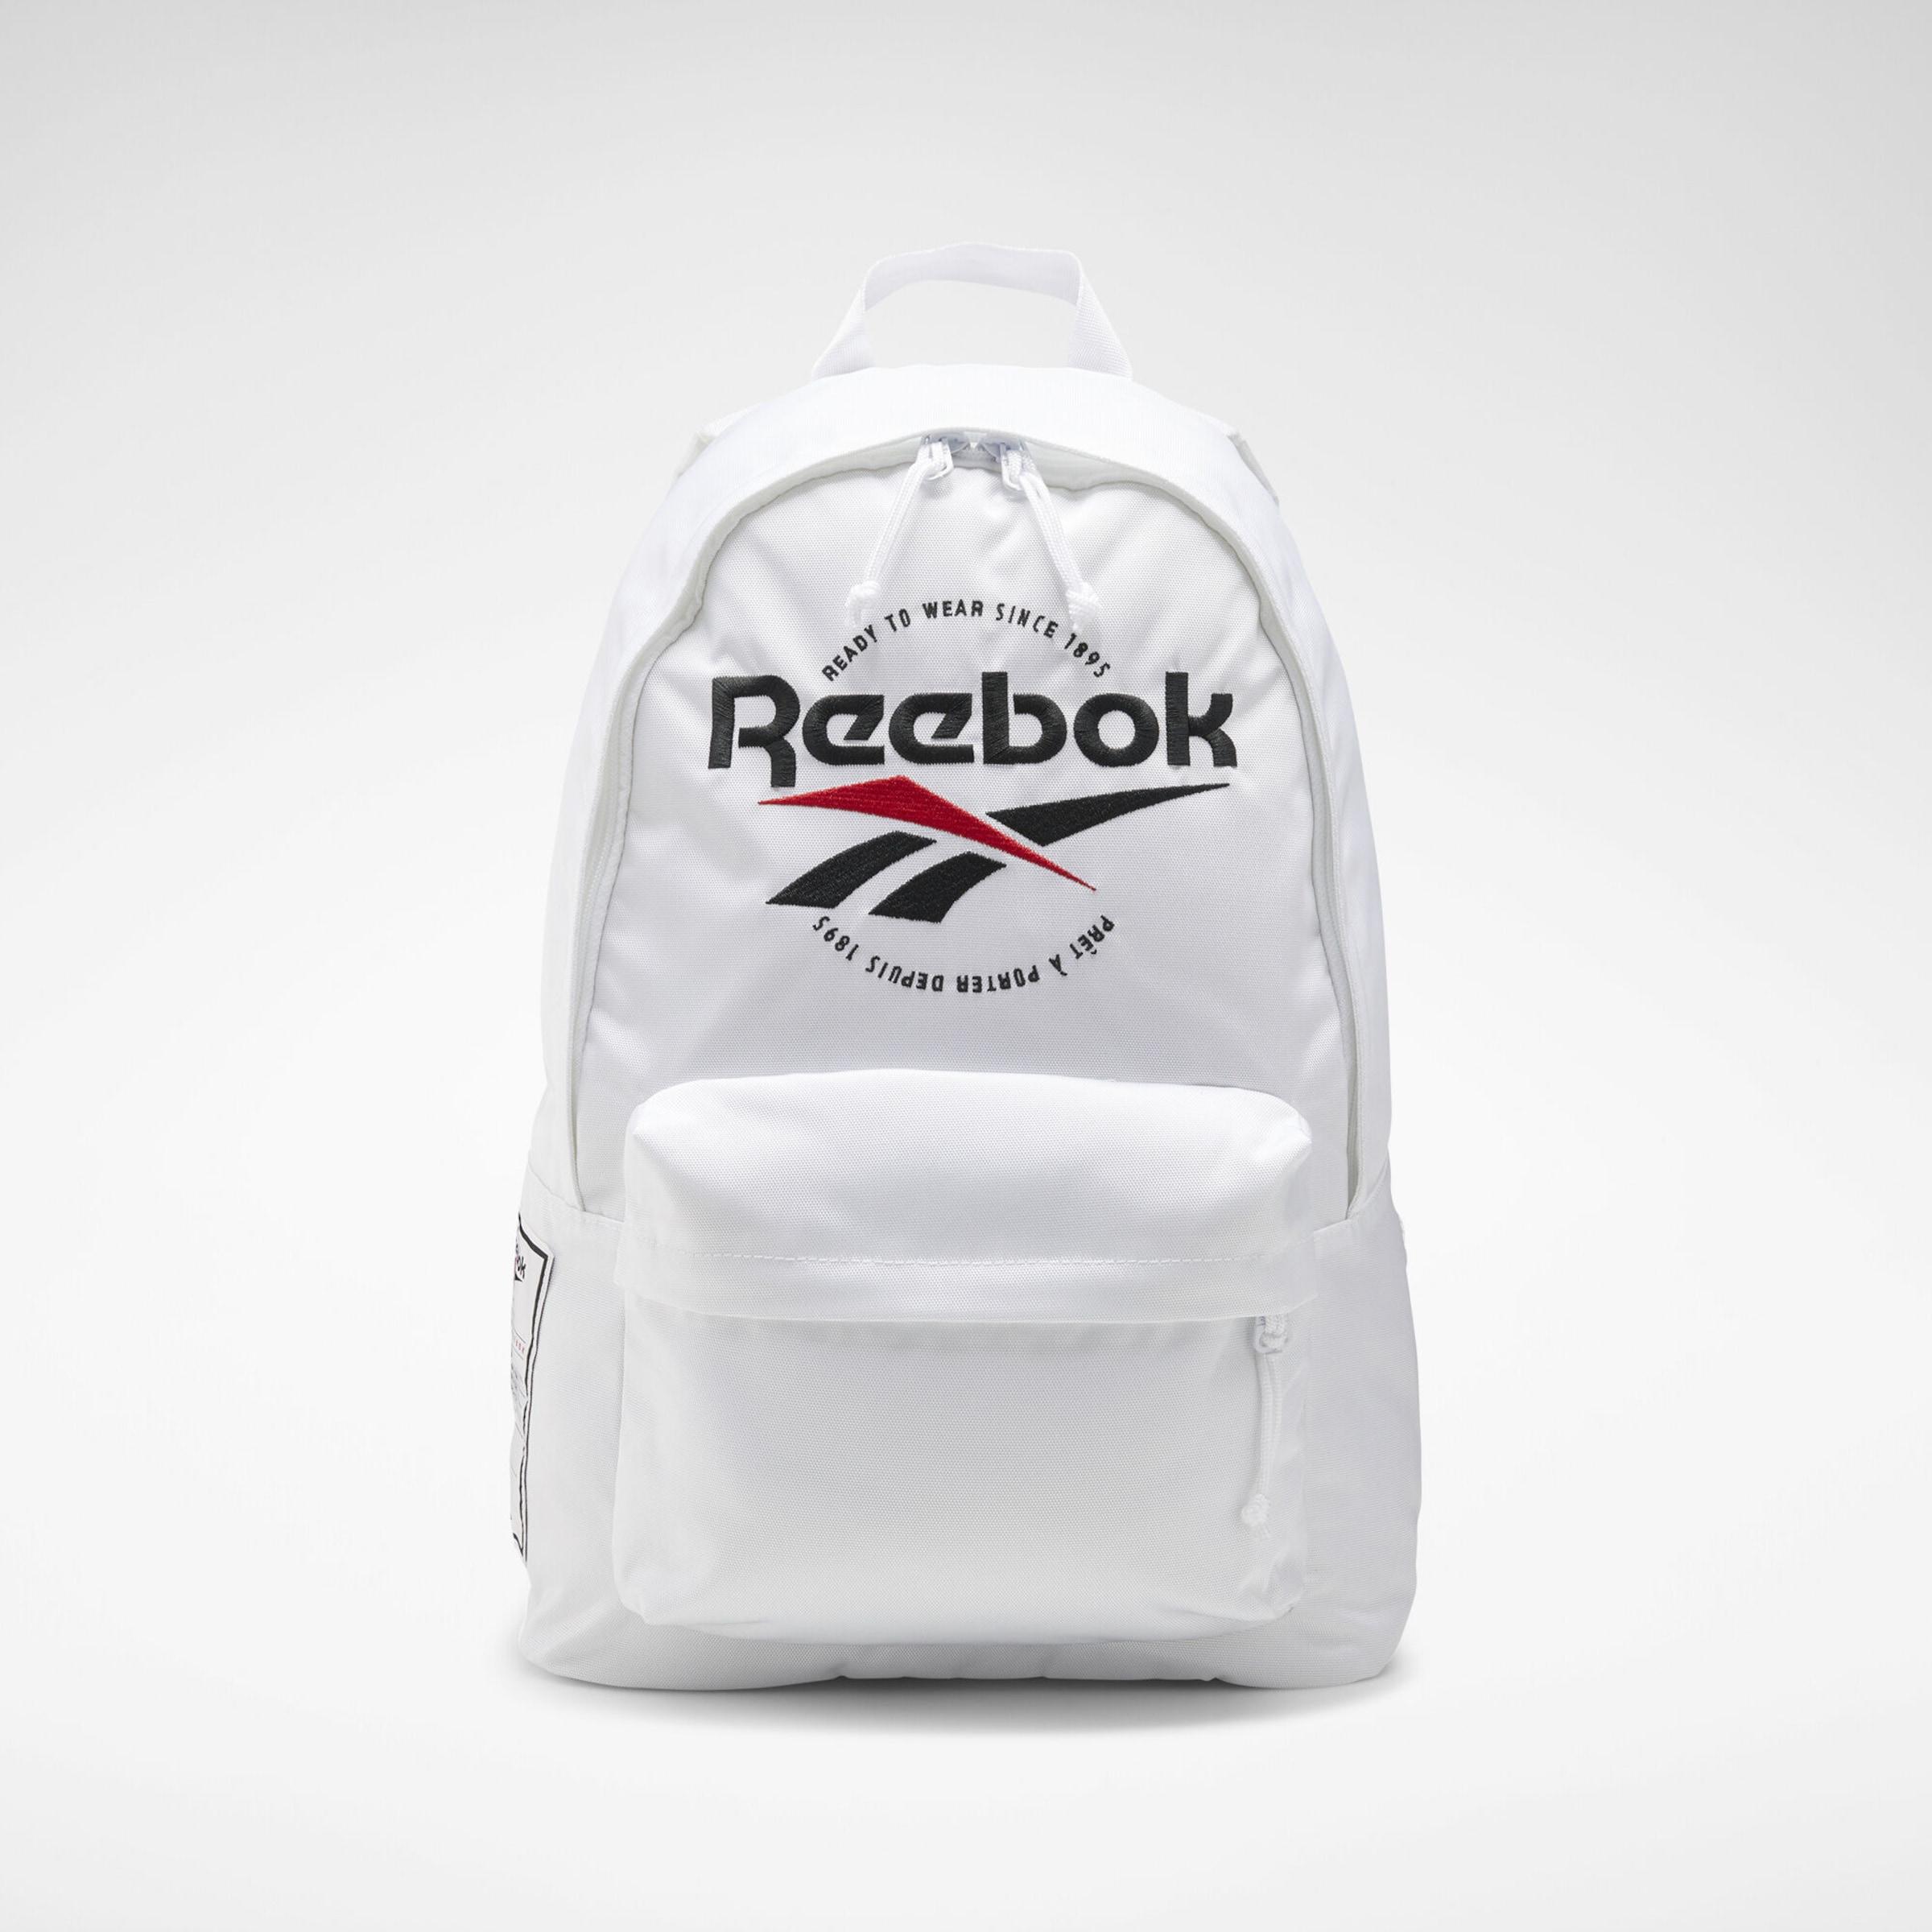 Reebok Rucksack In Reebok Classic Classic Rucksack In Rucksack Weiß Classic Weiß Reebok PwkO0n